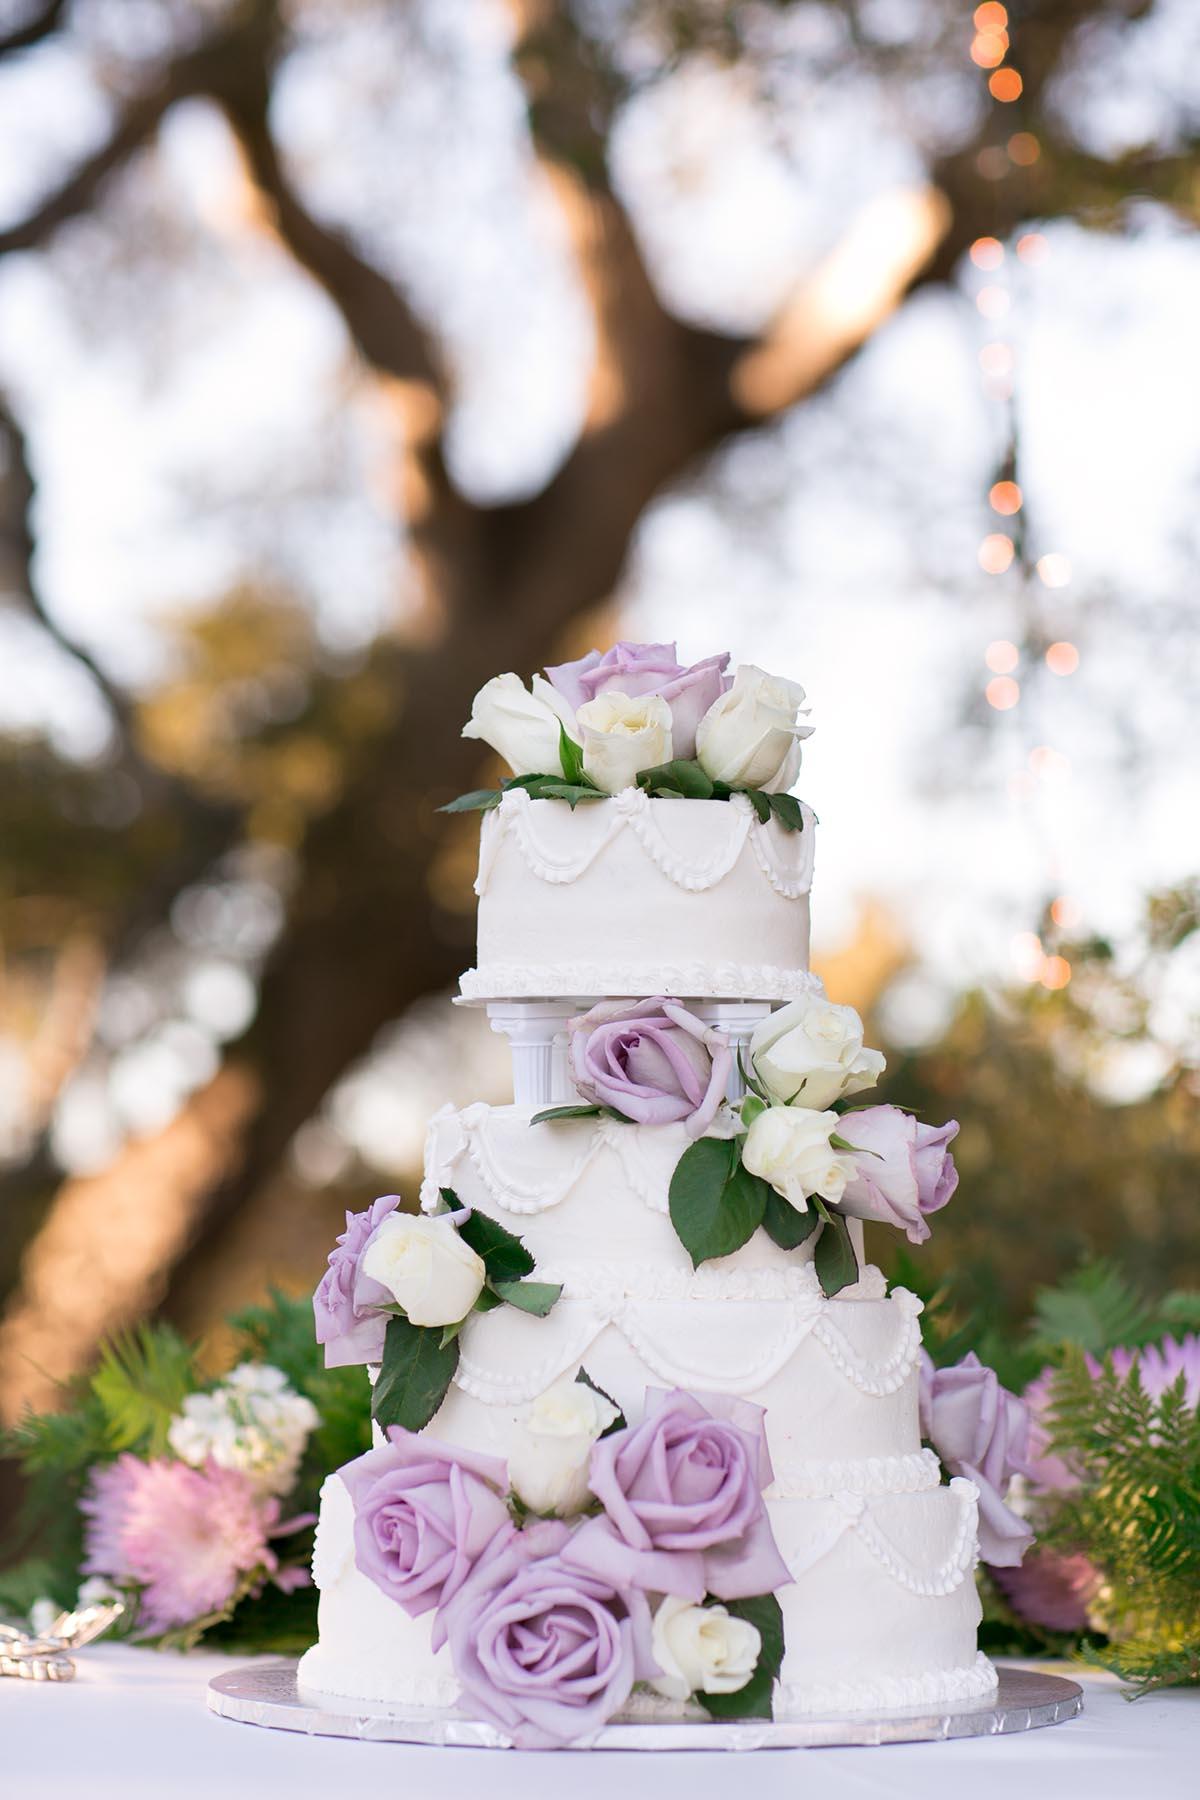 Santa Barbara Wedding Officiant Miriam Lindbeck   Non-Denominational Minister Serving Southern California